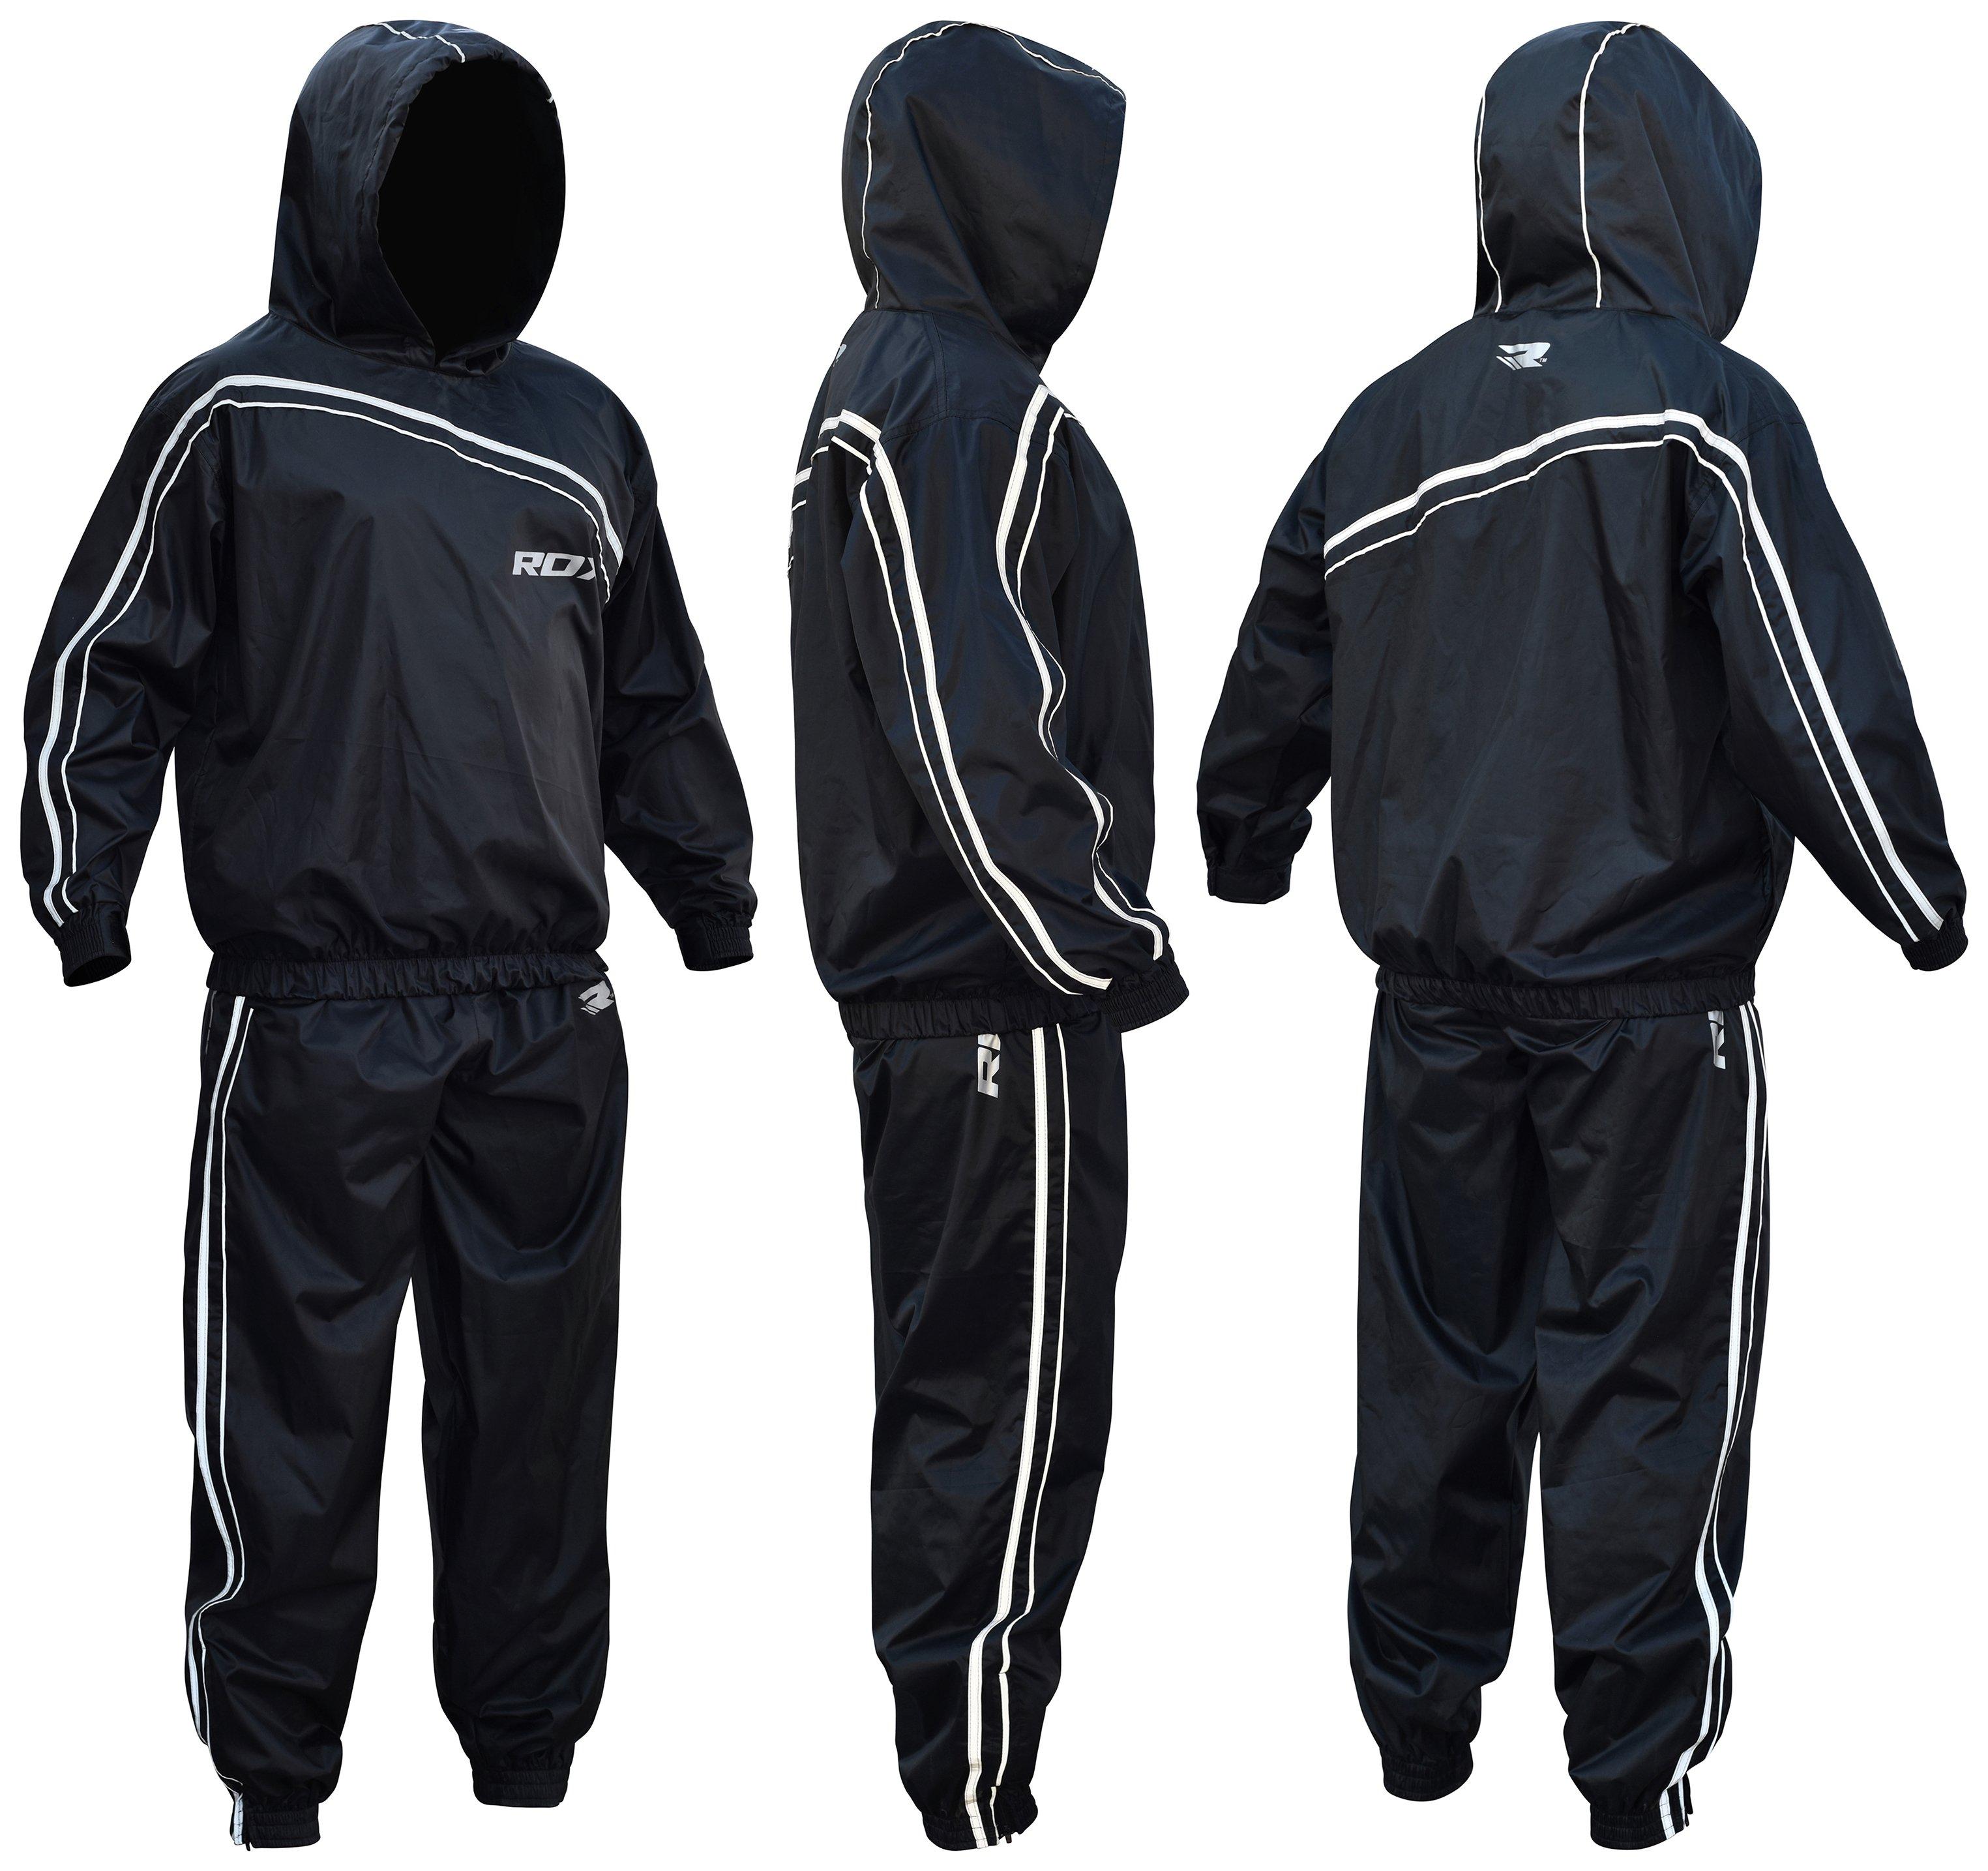 rdx-nylon-large-sauna-sweat-suit-black